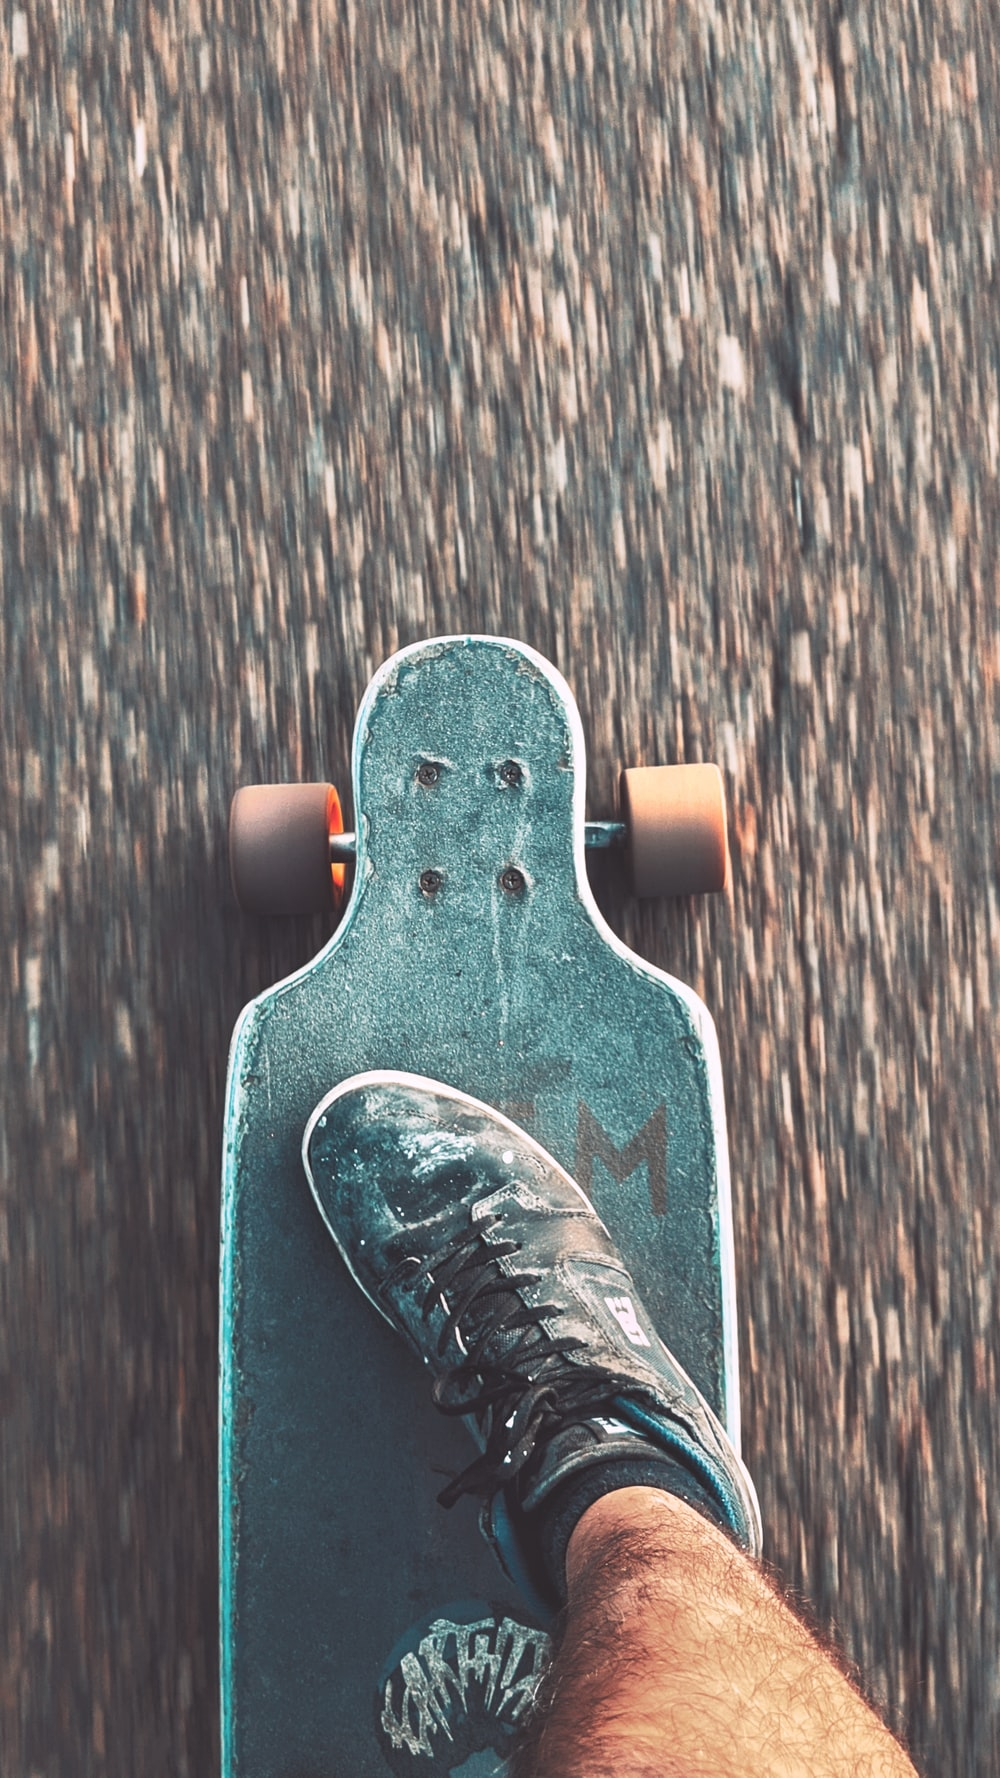 black and white skateboard on brown wooden floor